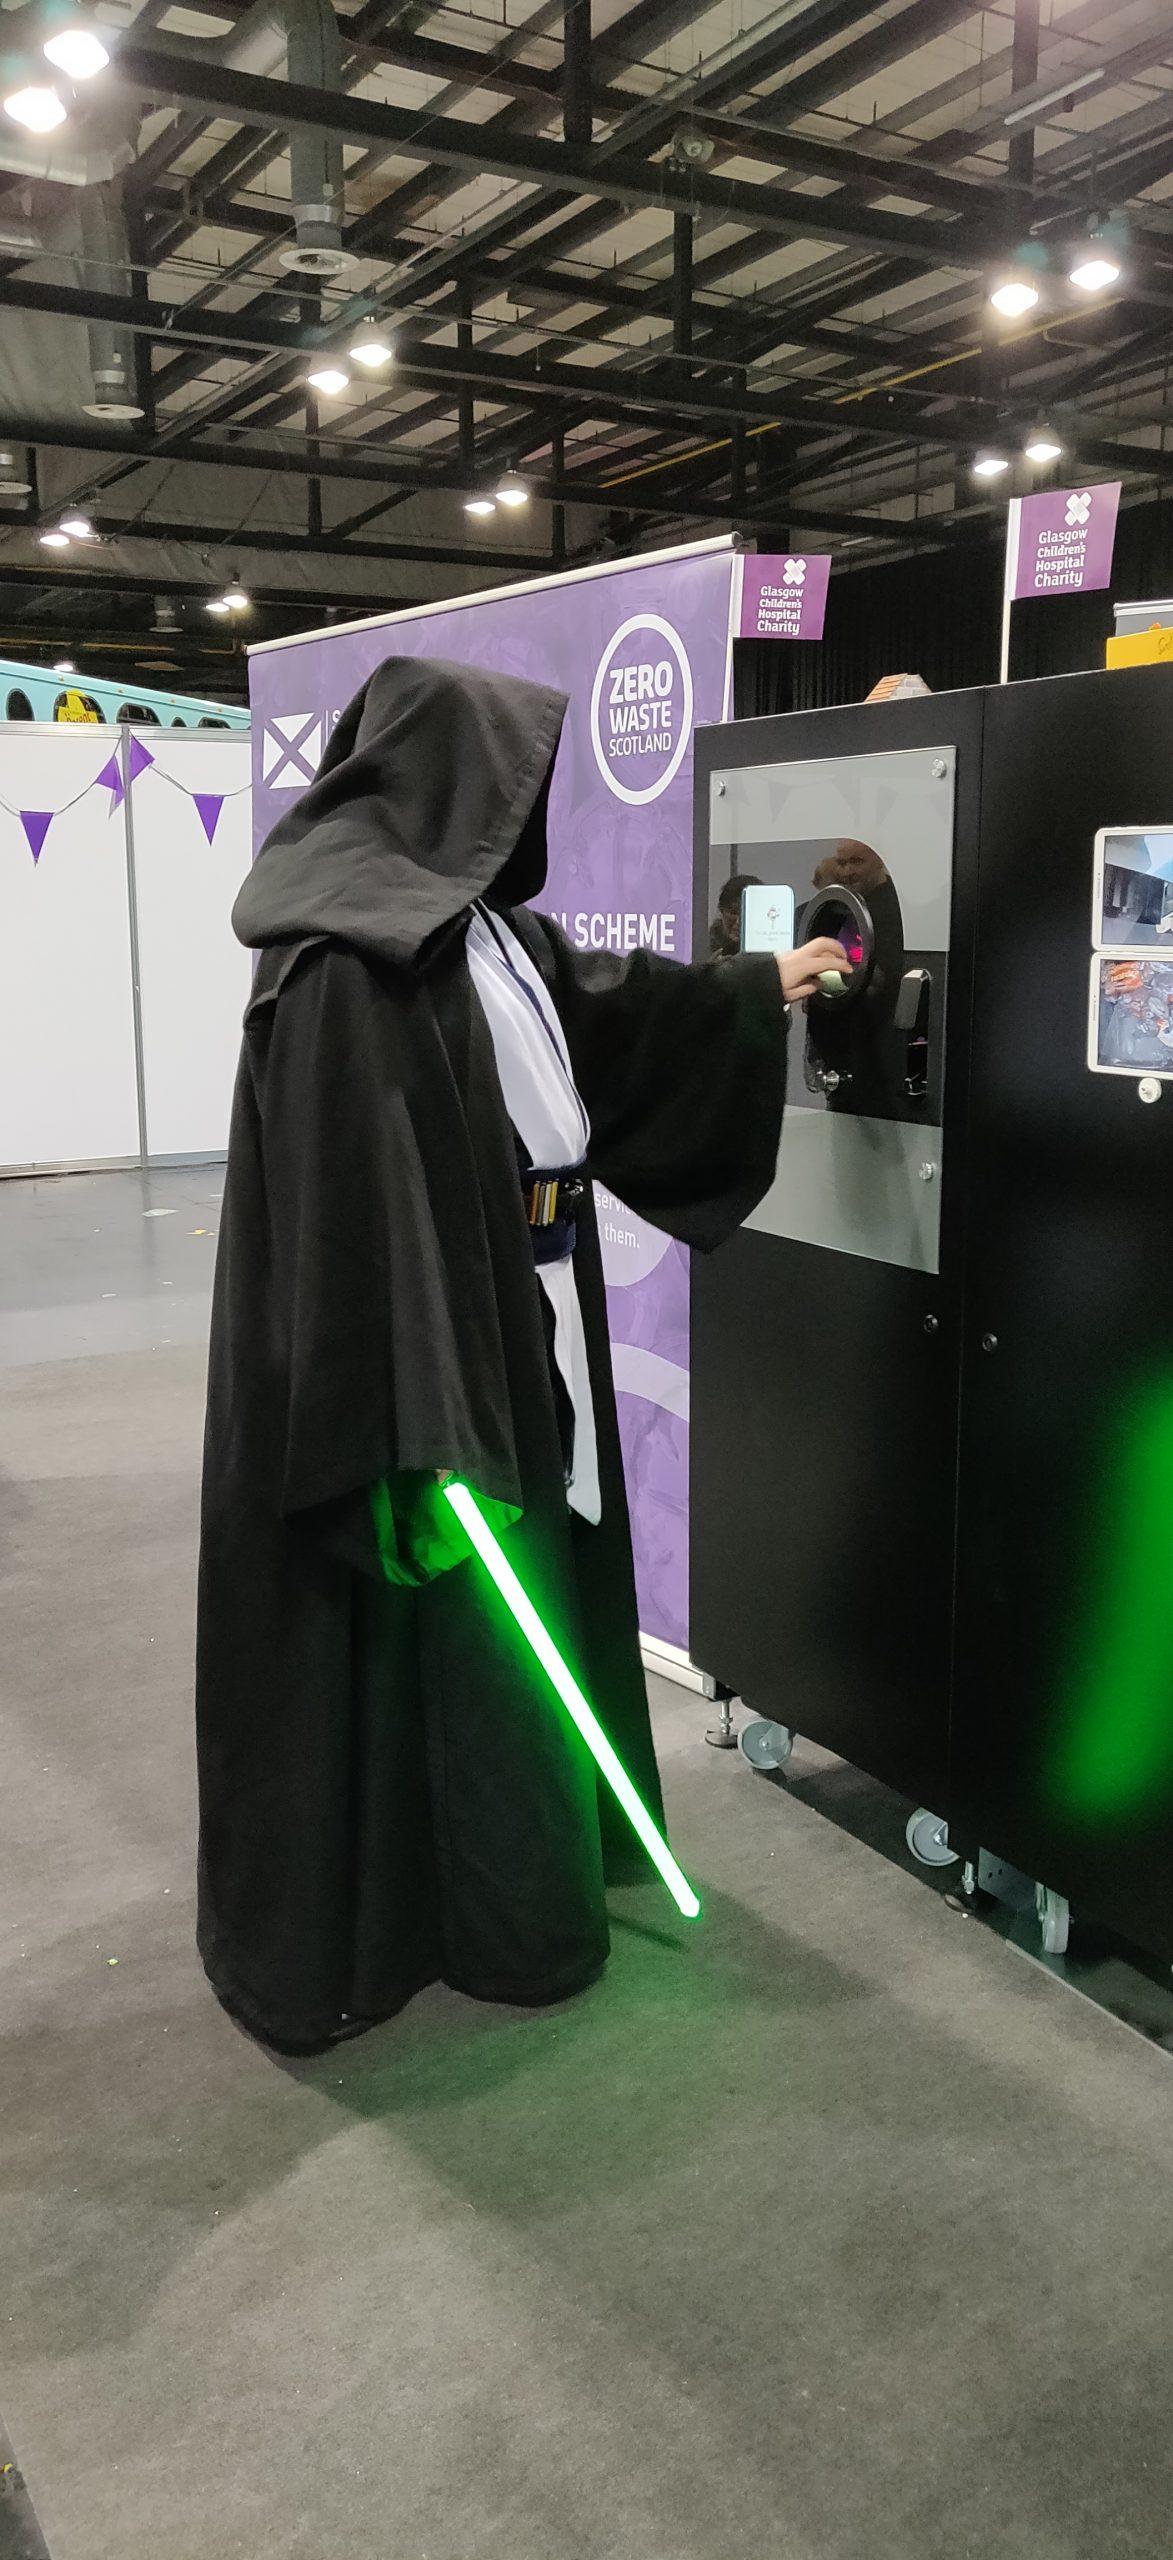 Obi Wan Kenobi using the Reverse Vending at Zero Waste Scotland Stand